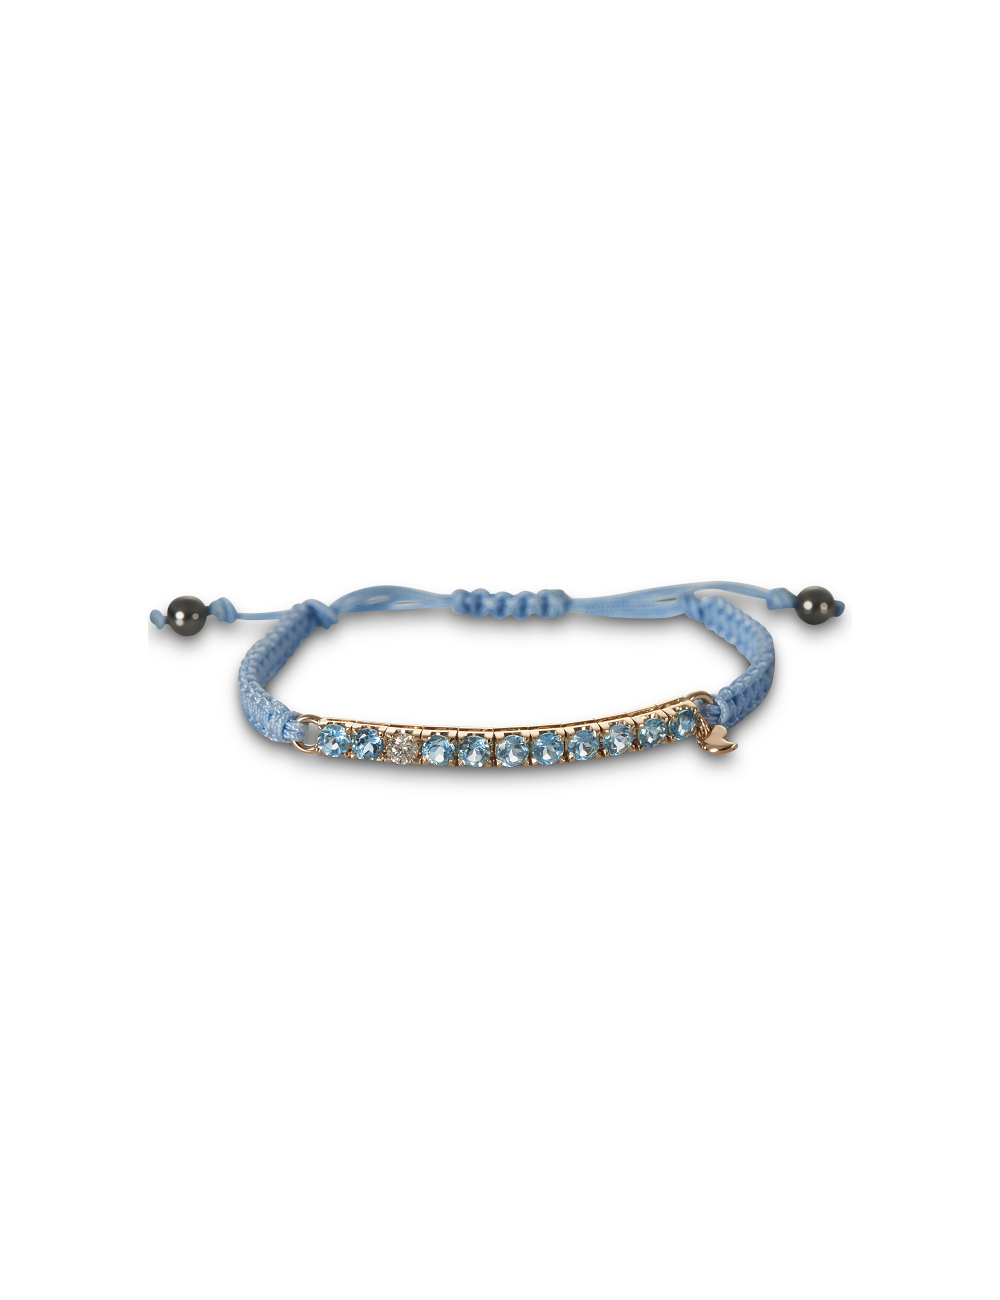 Cervera -Pulsera macramé twisted topacios azules -P775B/TA